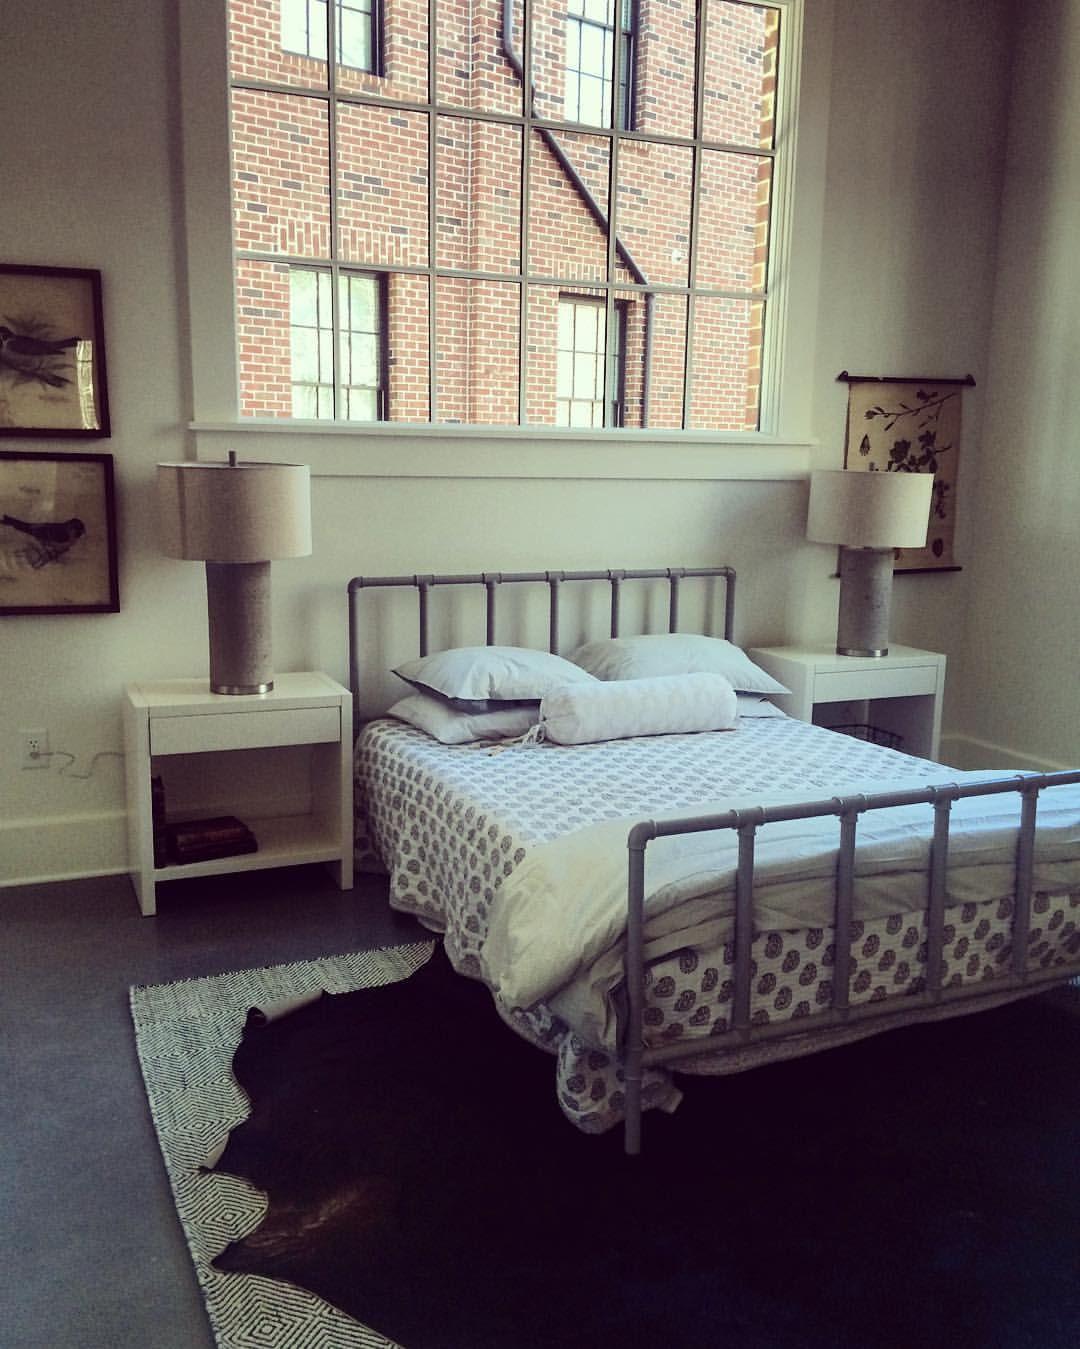 Neues schlafzimmer interieur  likes  comments  julie holloway juliehollowaystudio on